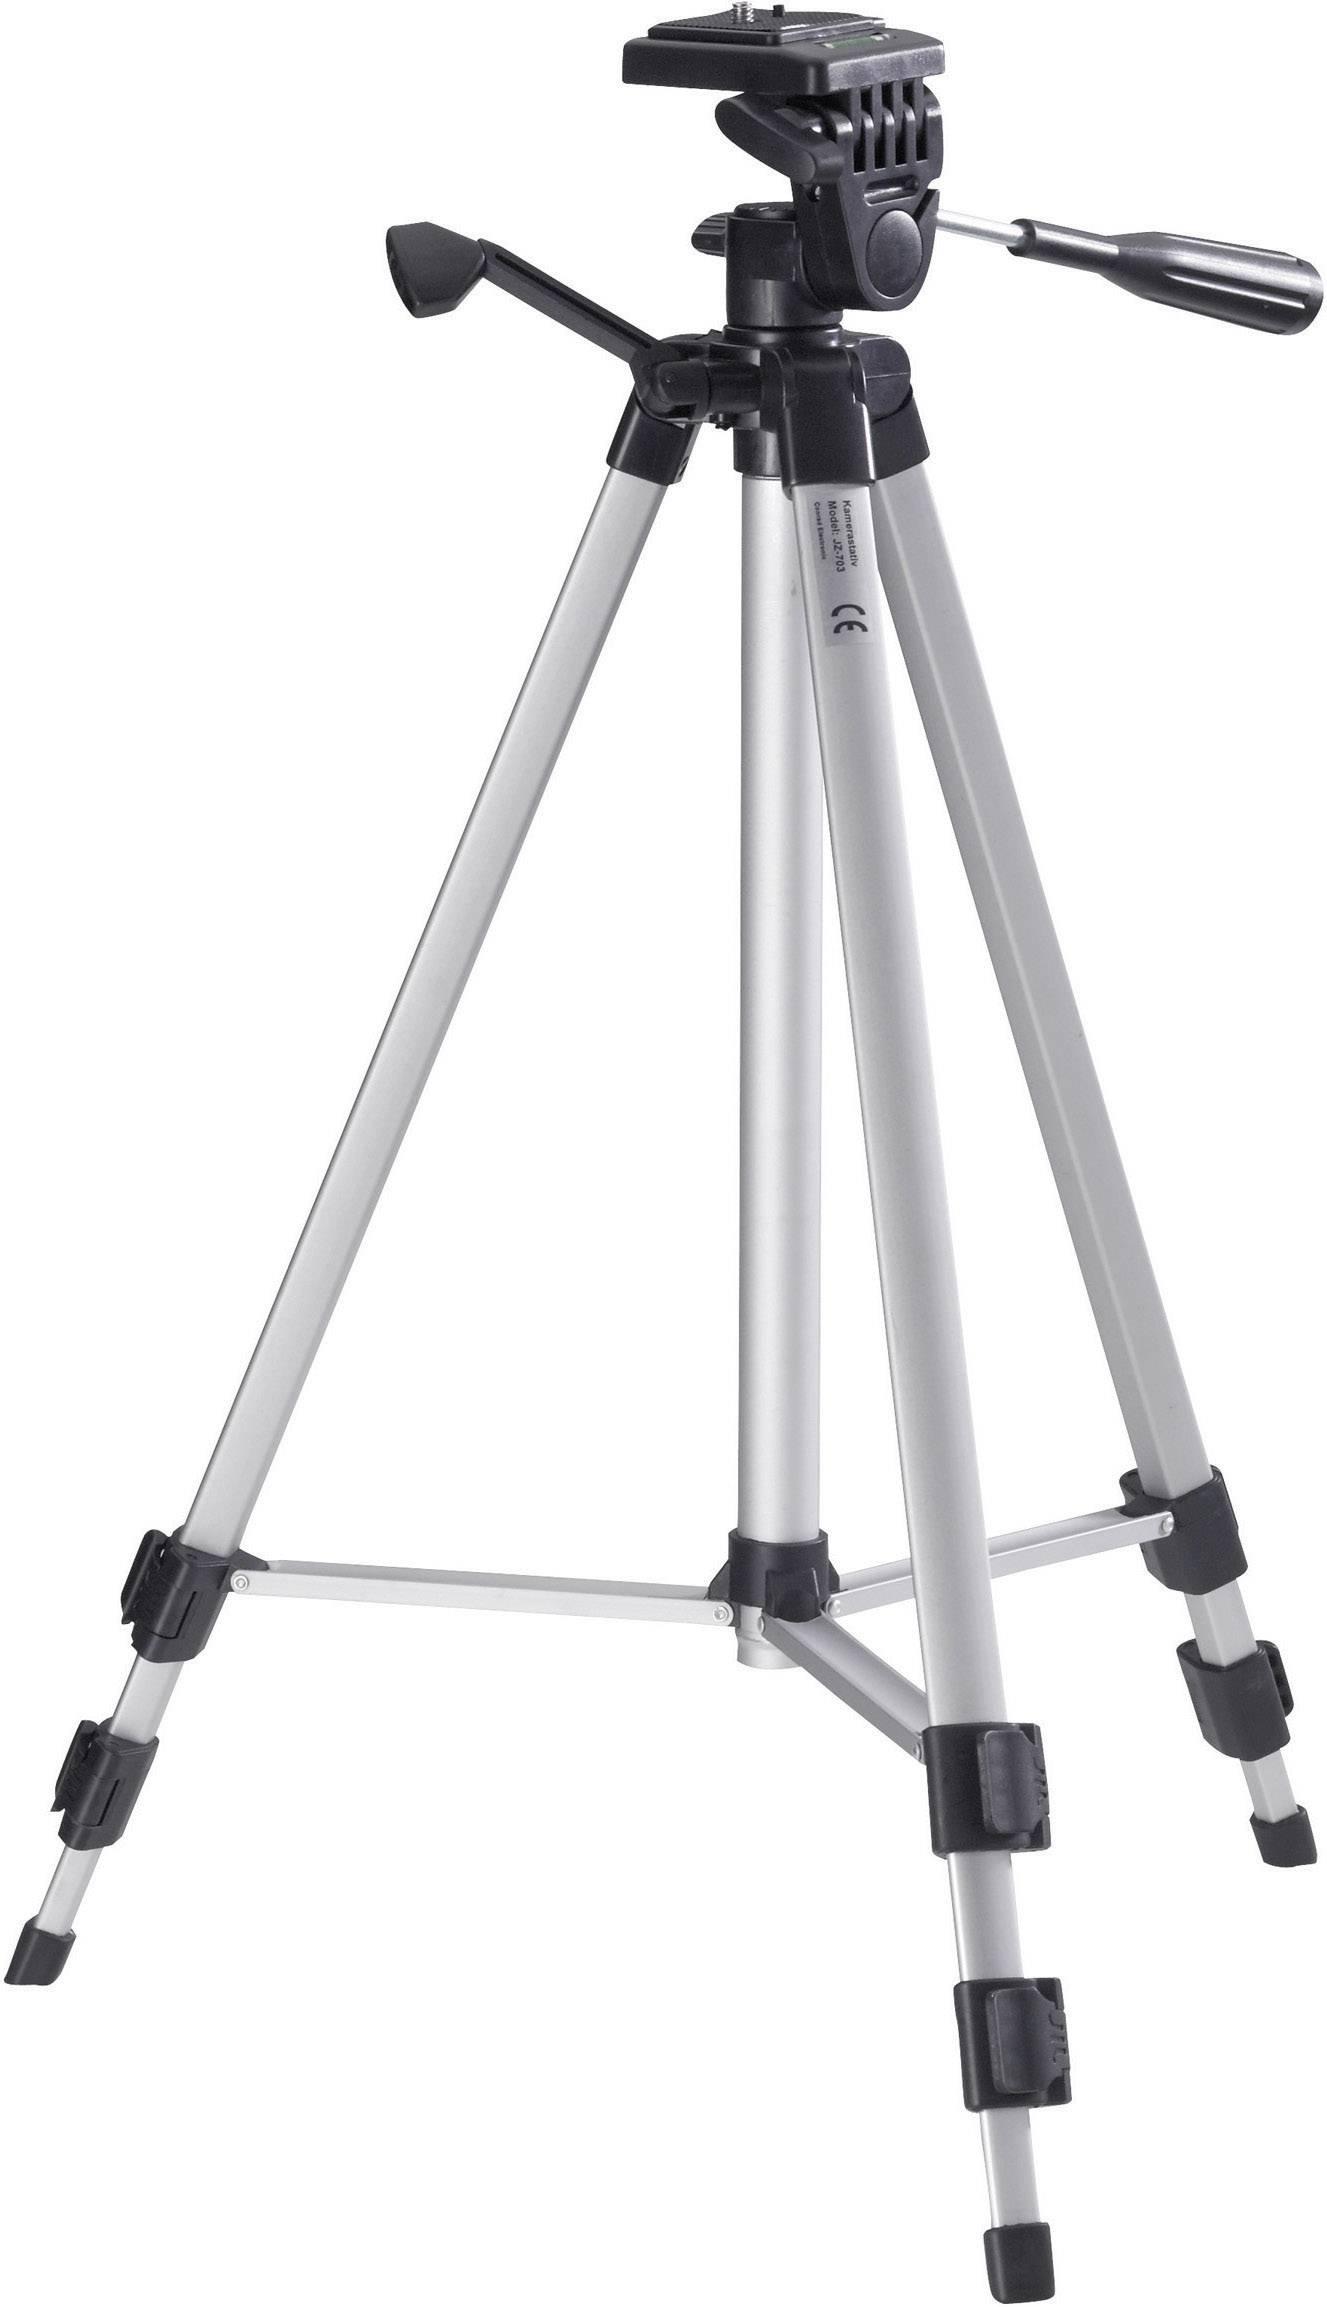 Foto/video stativ Compact, 51,5 - 134,5 cm